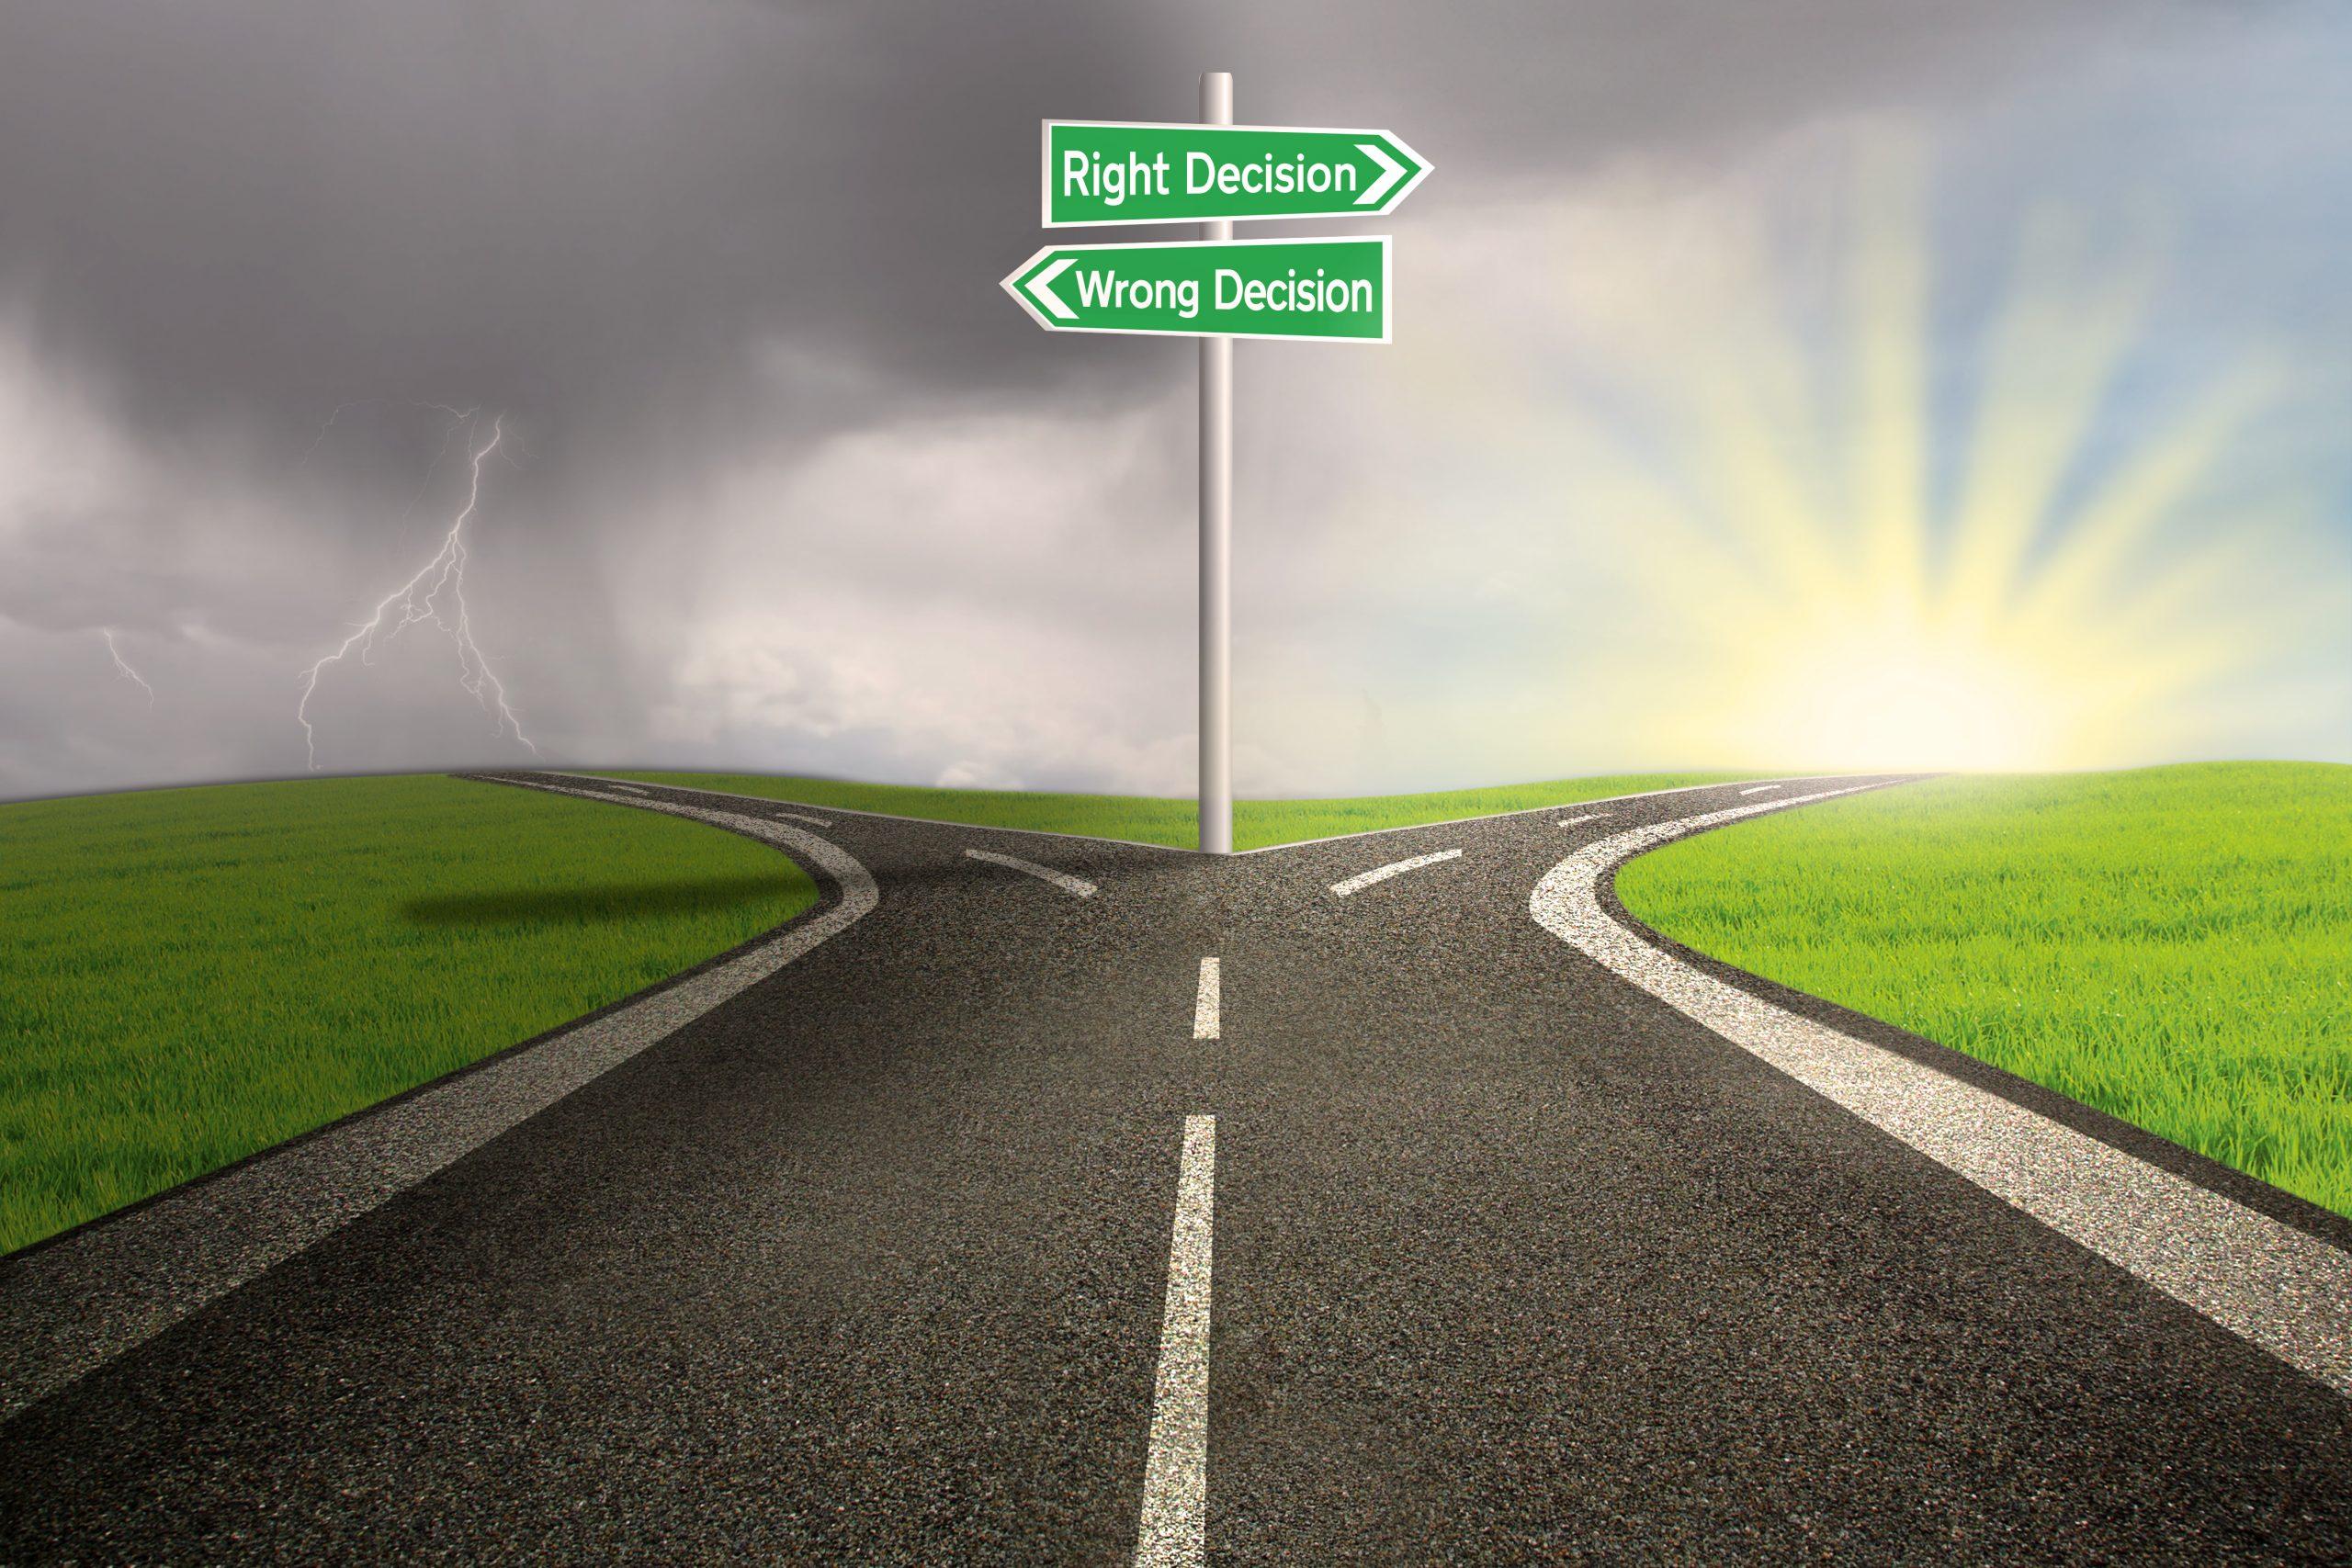 https://depositphotos.com/19727323/stock-photo-road-sign-of-right-vs.html